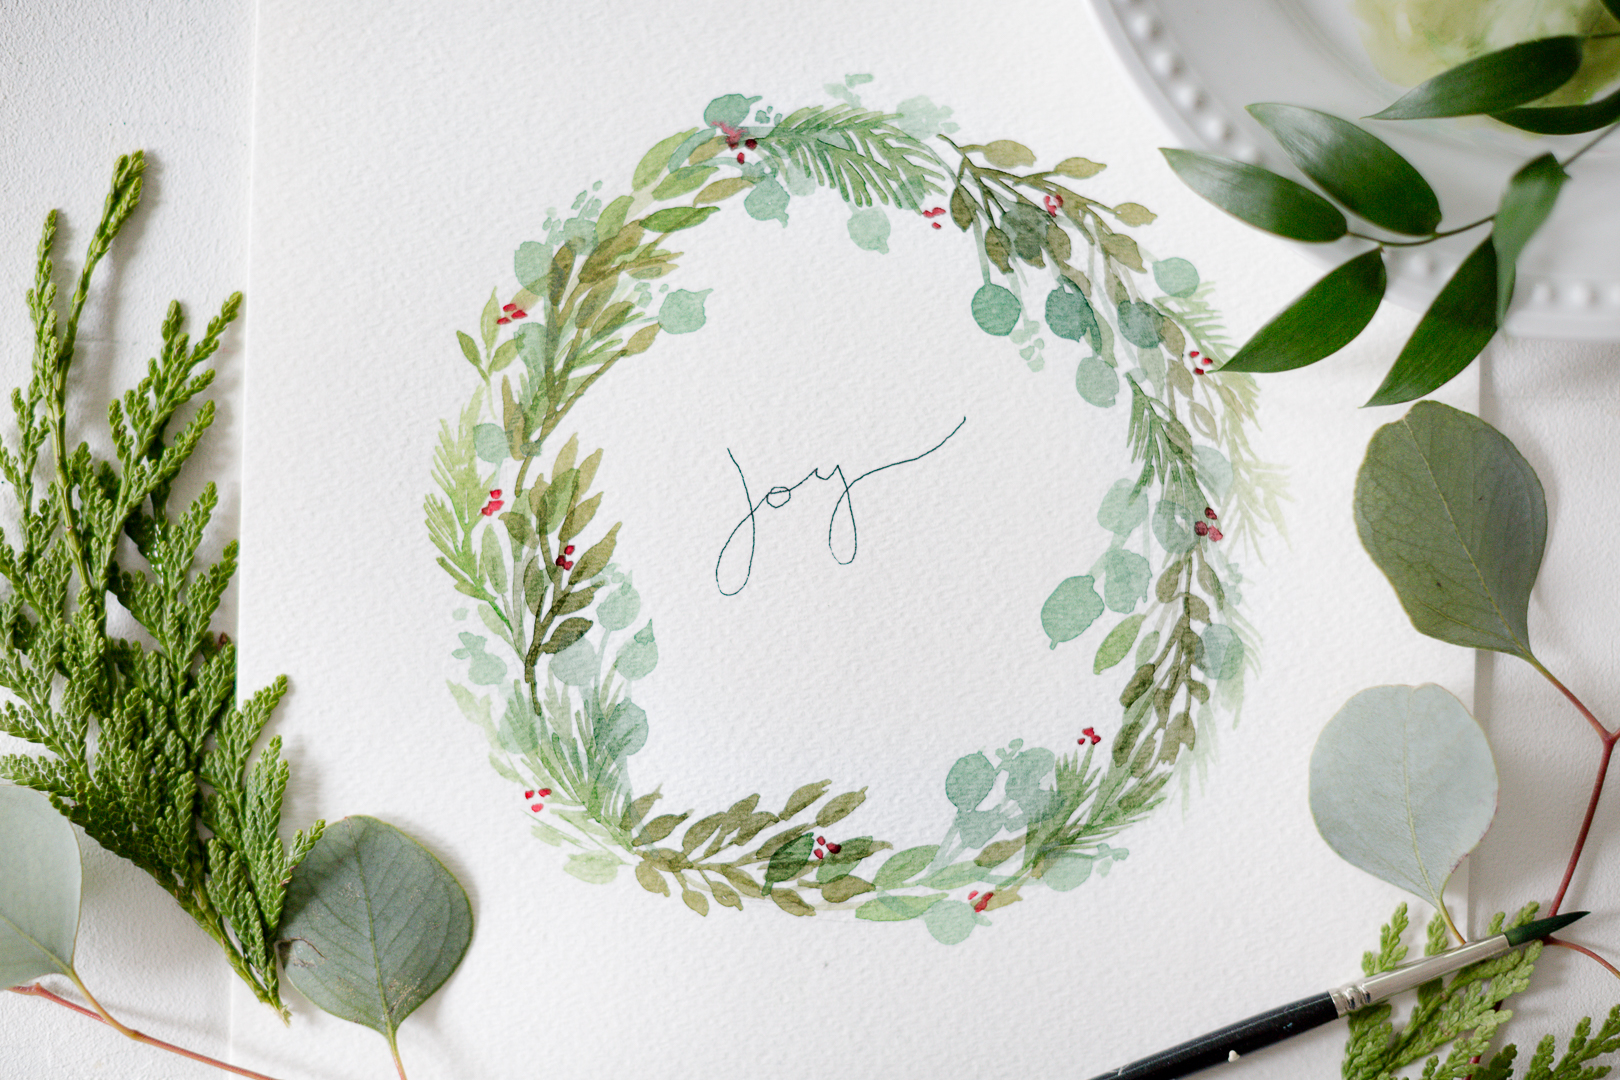 DIY watercolor Christmas wreath card or artwork